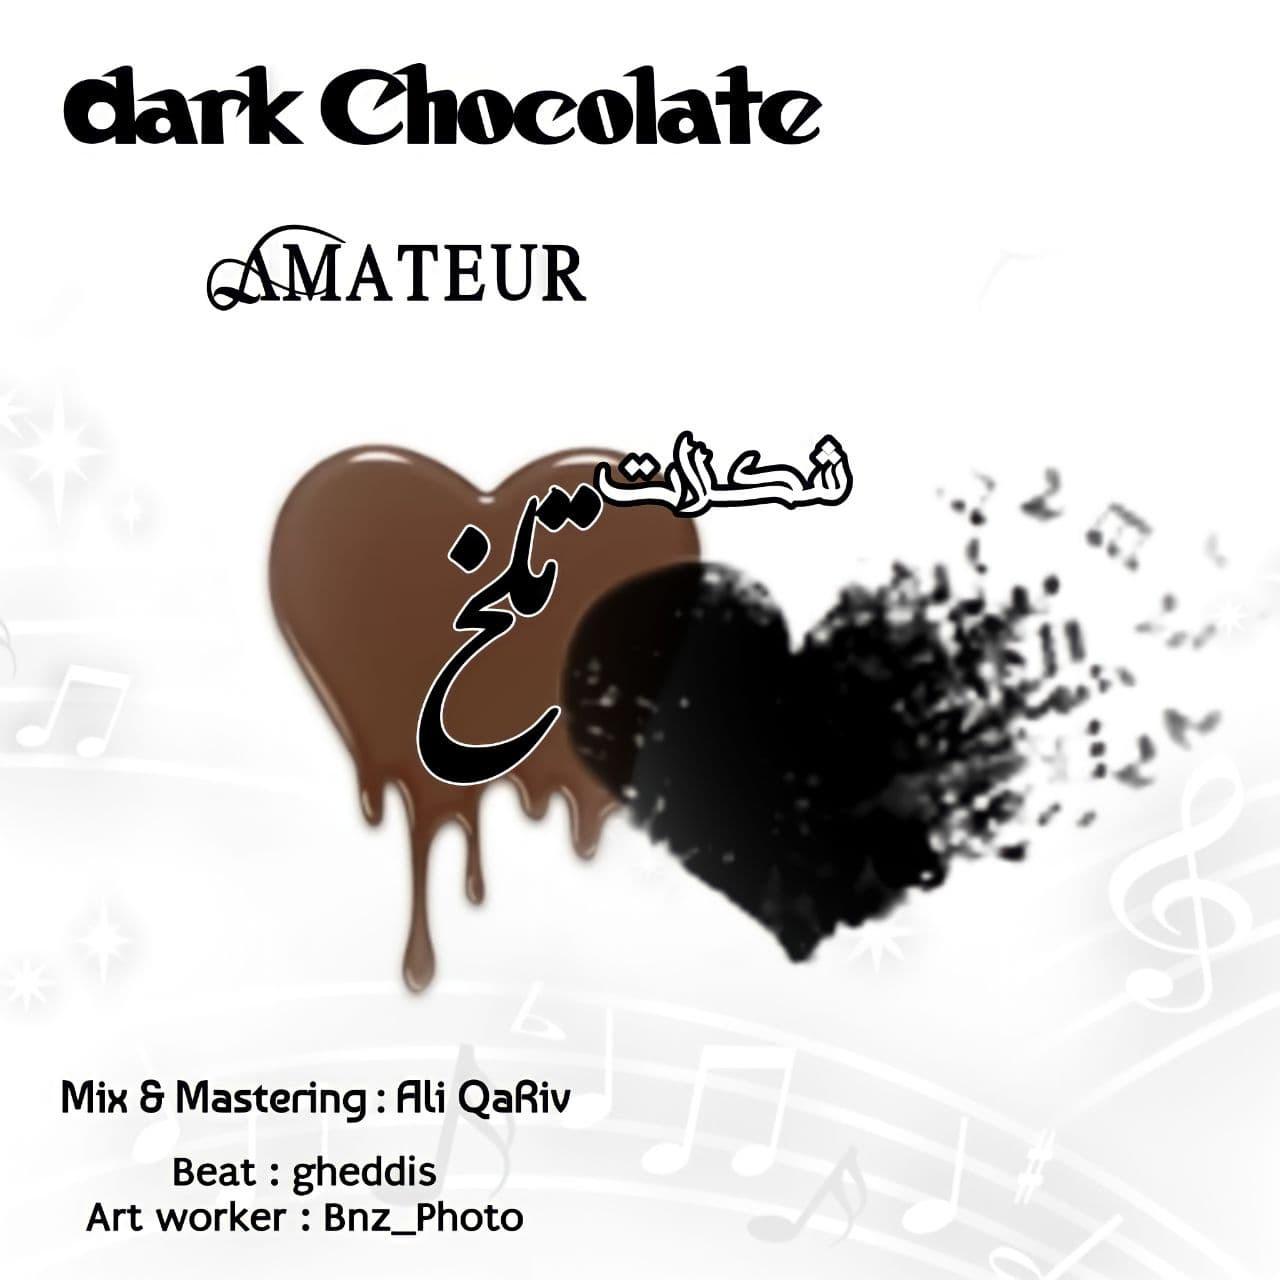 A-mateur - Dark Chocolate